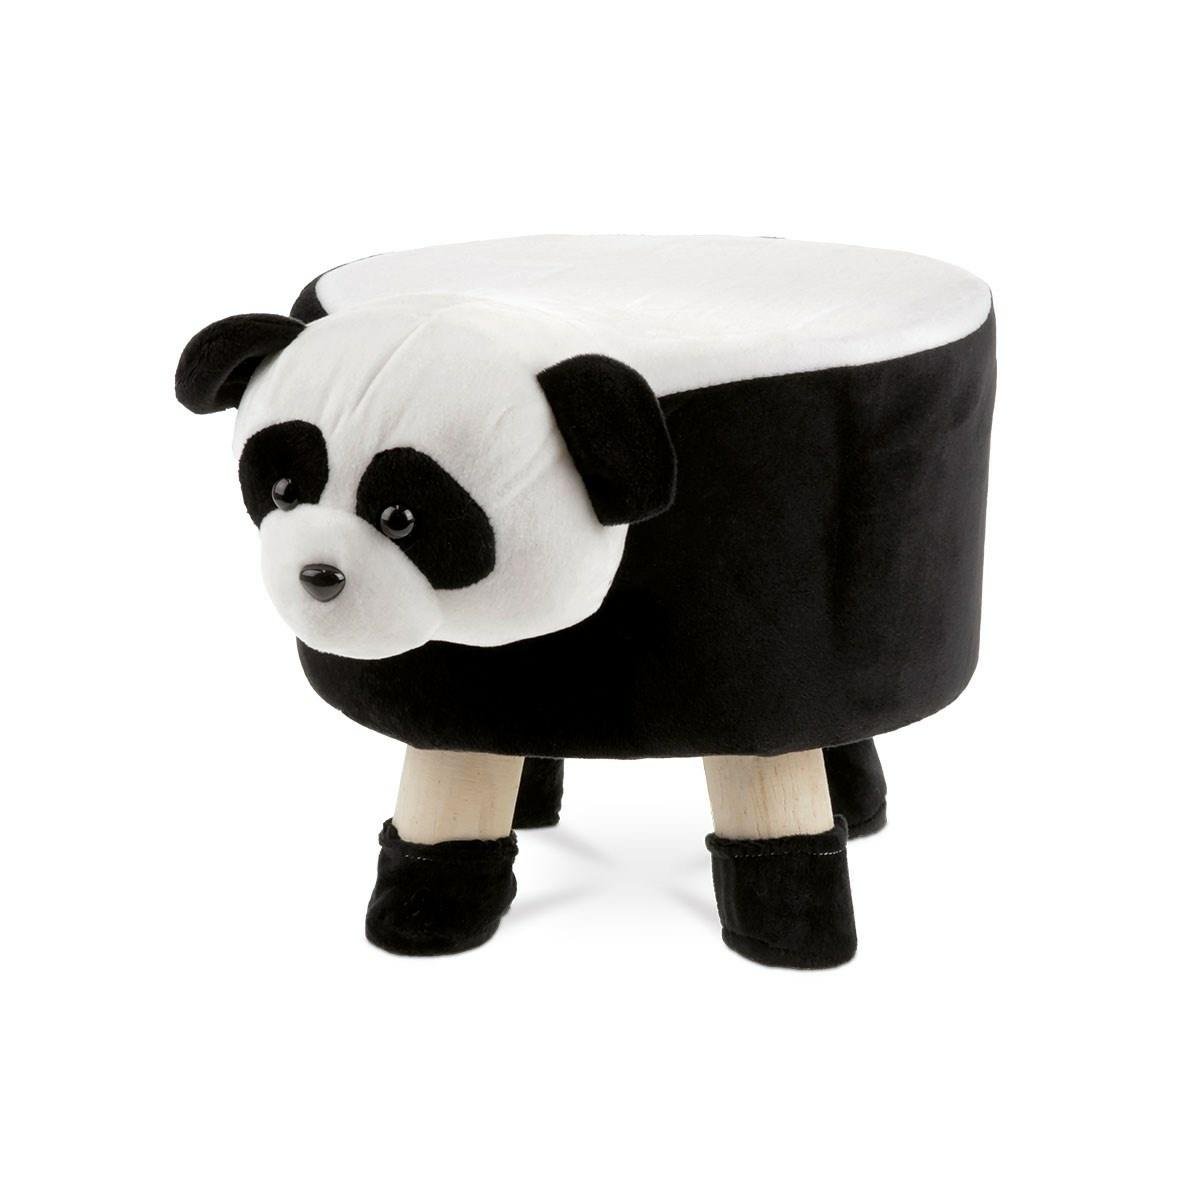 Taburet Little Panda, 29 x 35 cm imagine 2021 e4home.ro